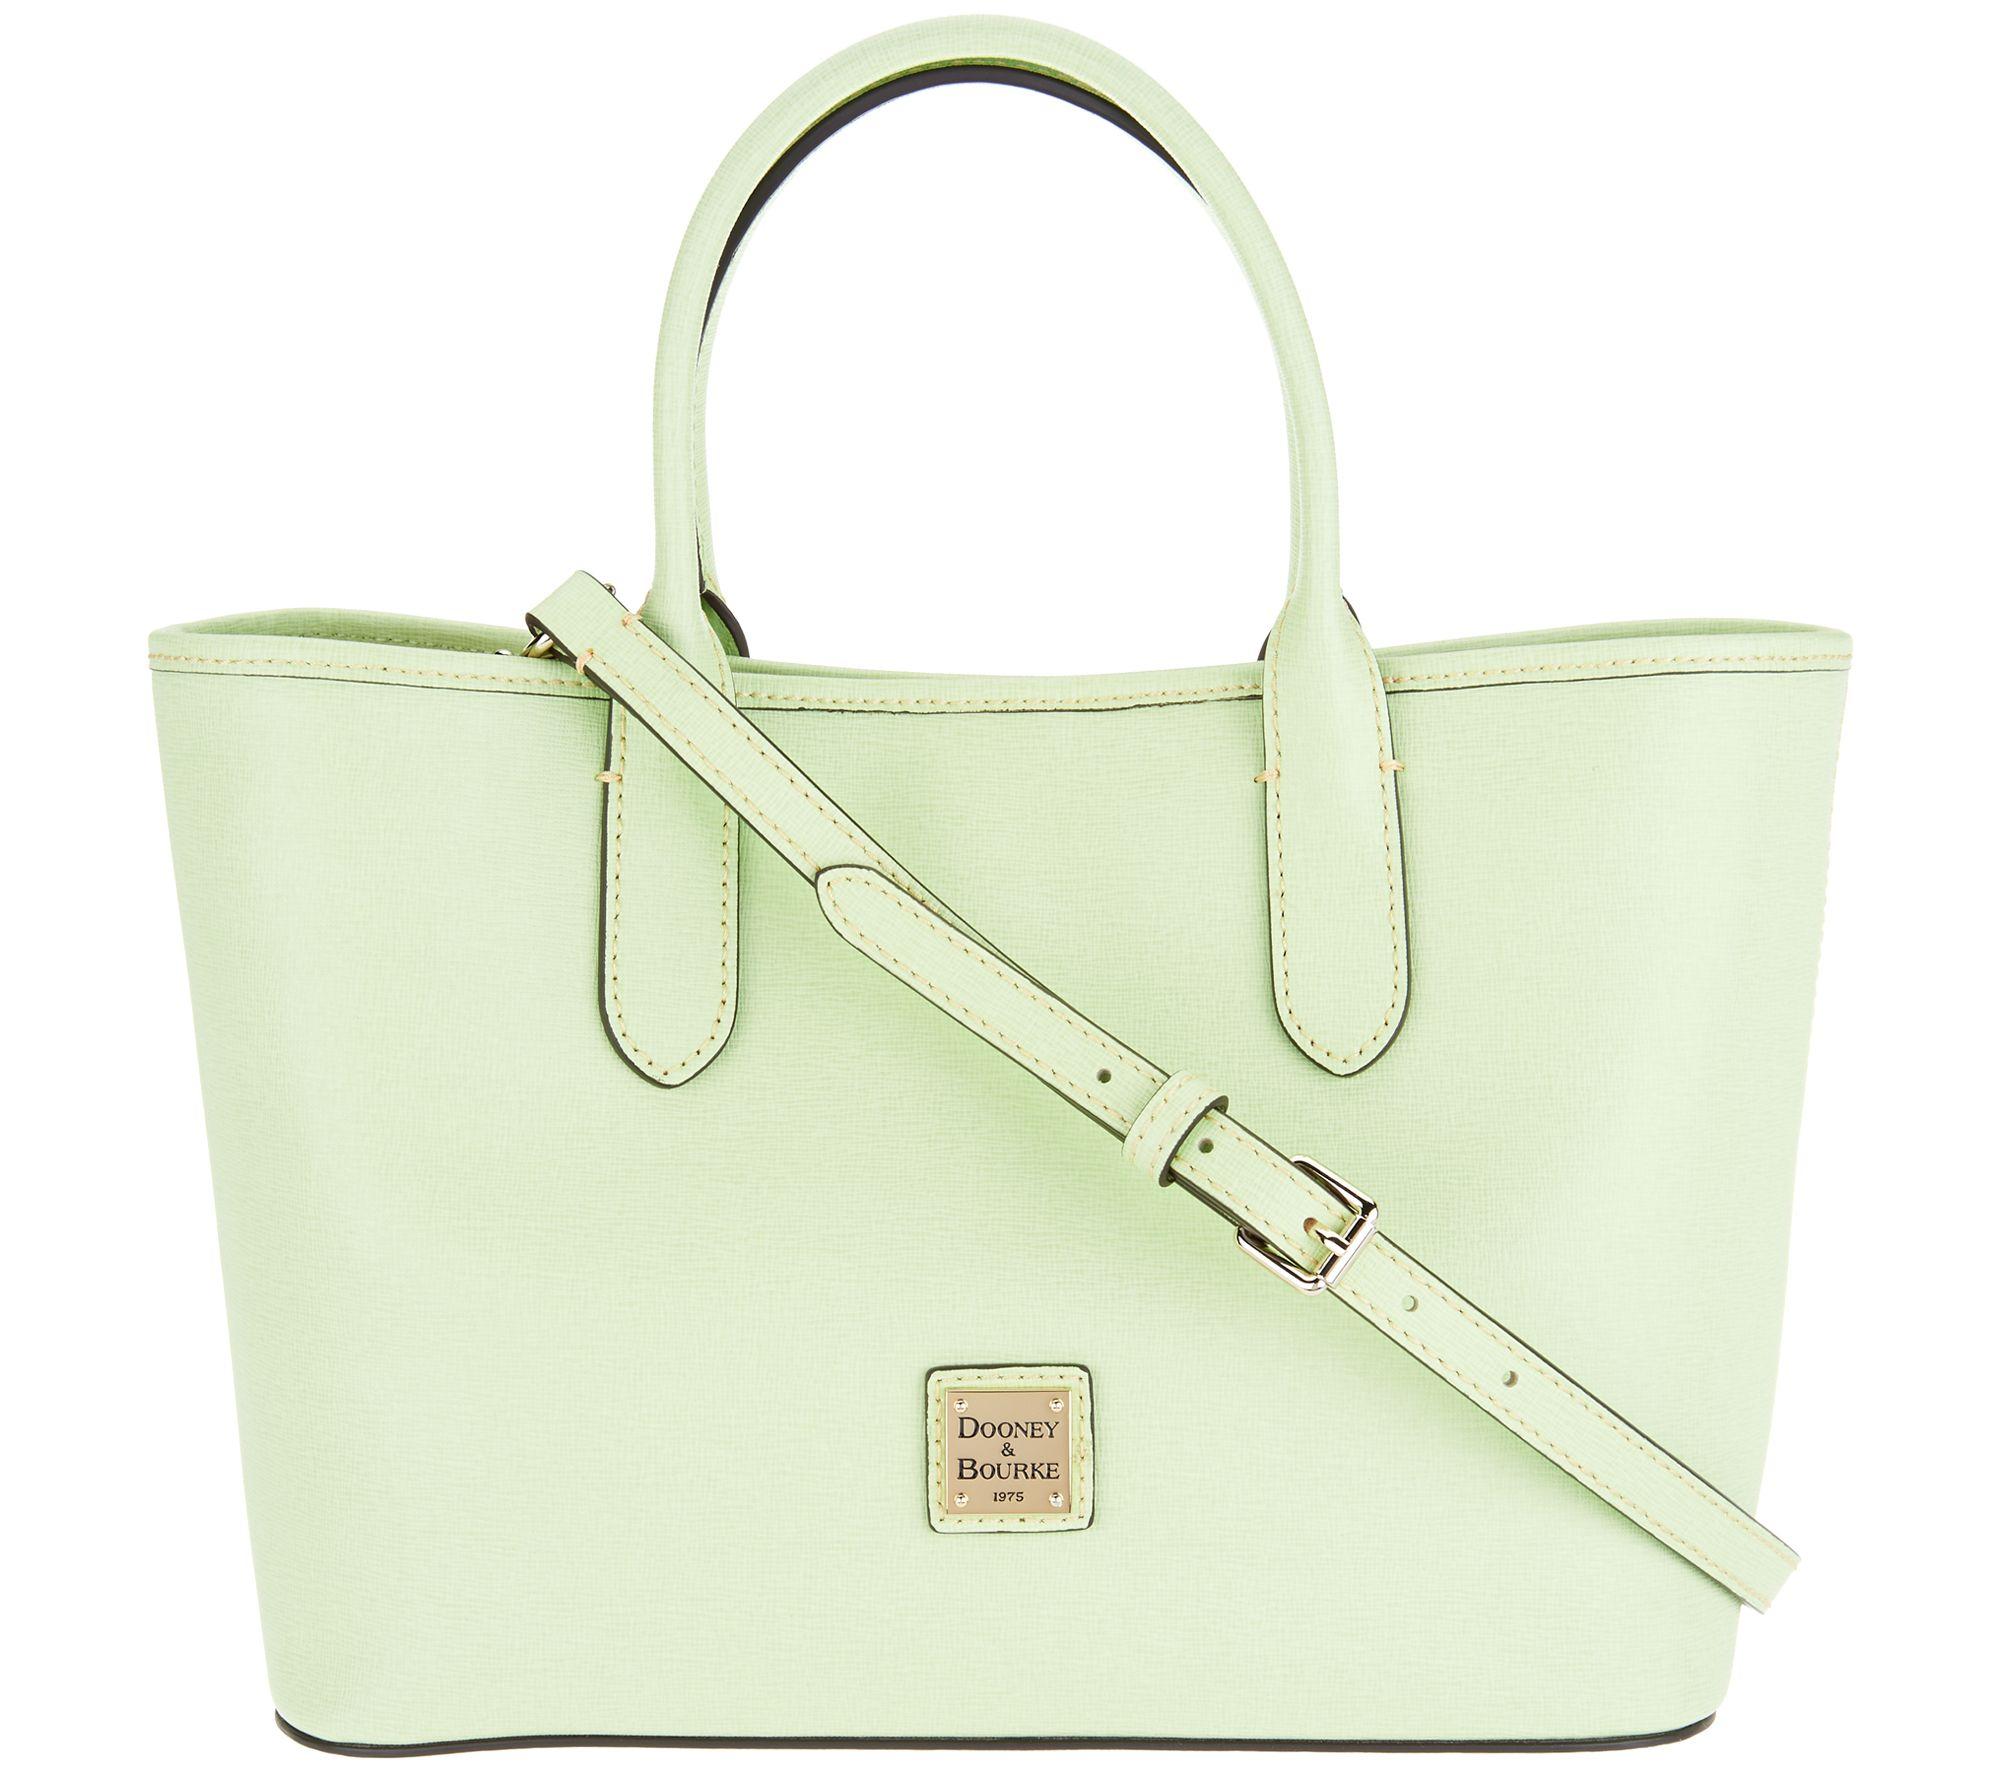 e2c5fa1a6 Dooney   Bourke Saffiano Leather Satchel Handbag -Brielle - Page 1 —  edpolicy.stanford